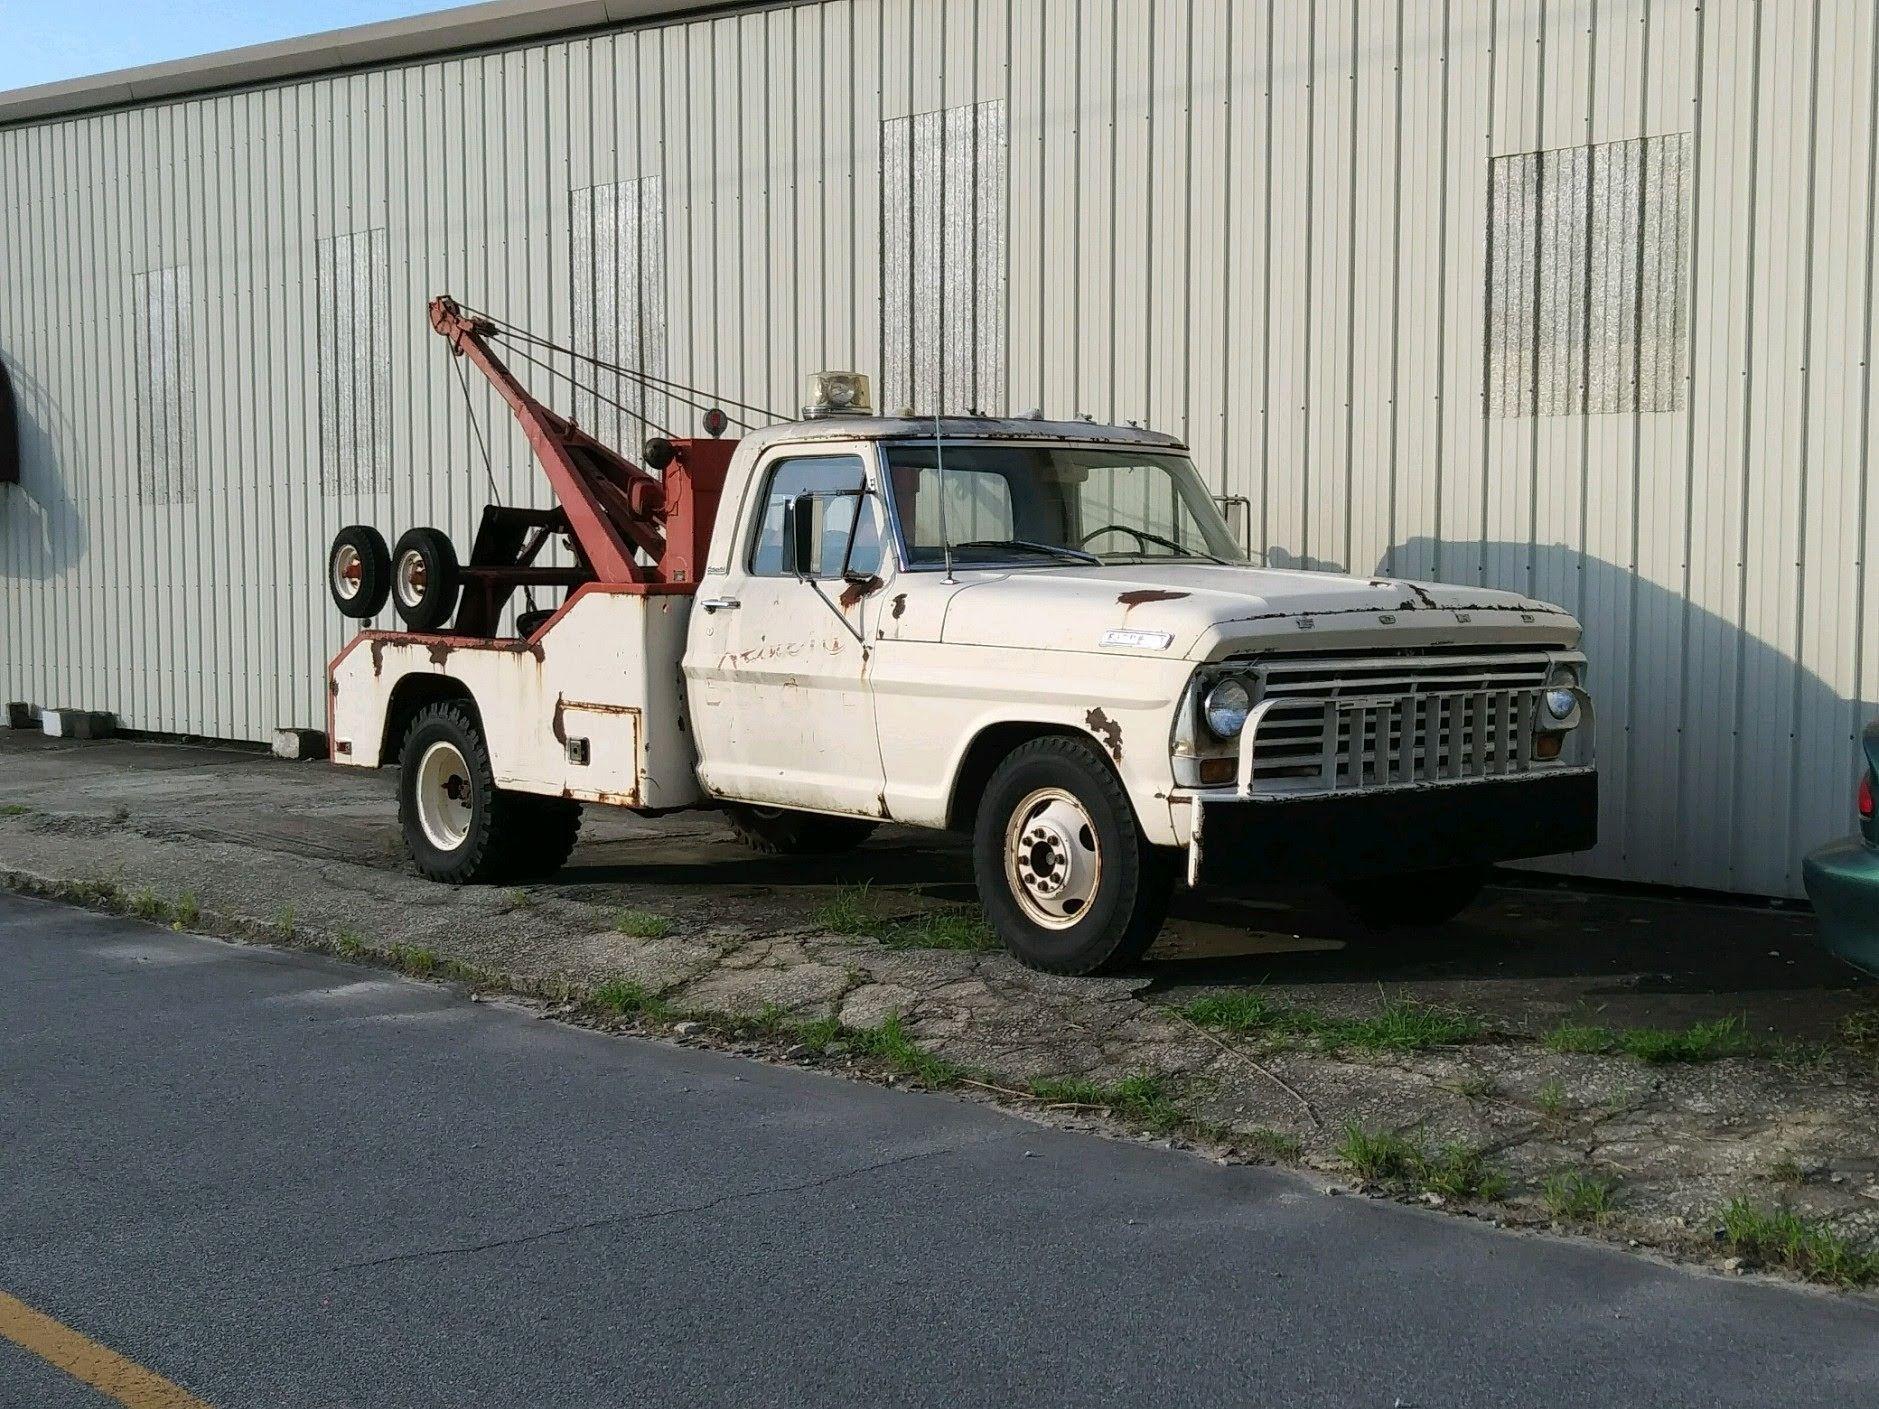 1967 ford f 350 tow truck livonia ga 7 5 18 antique classic